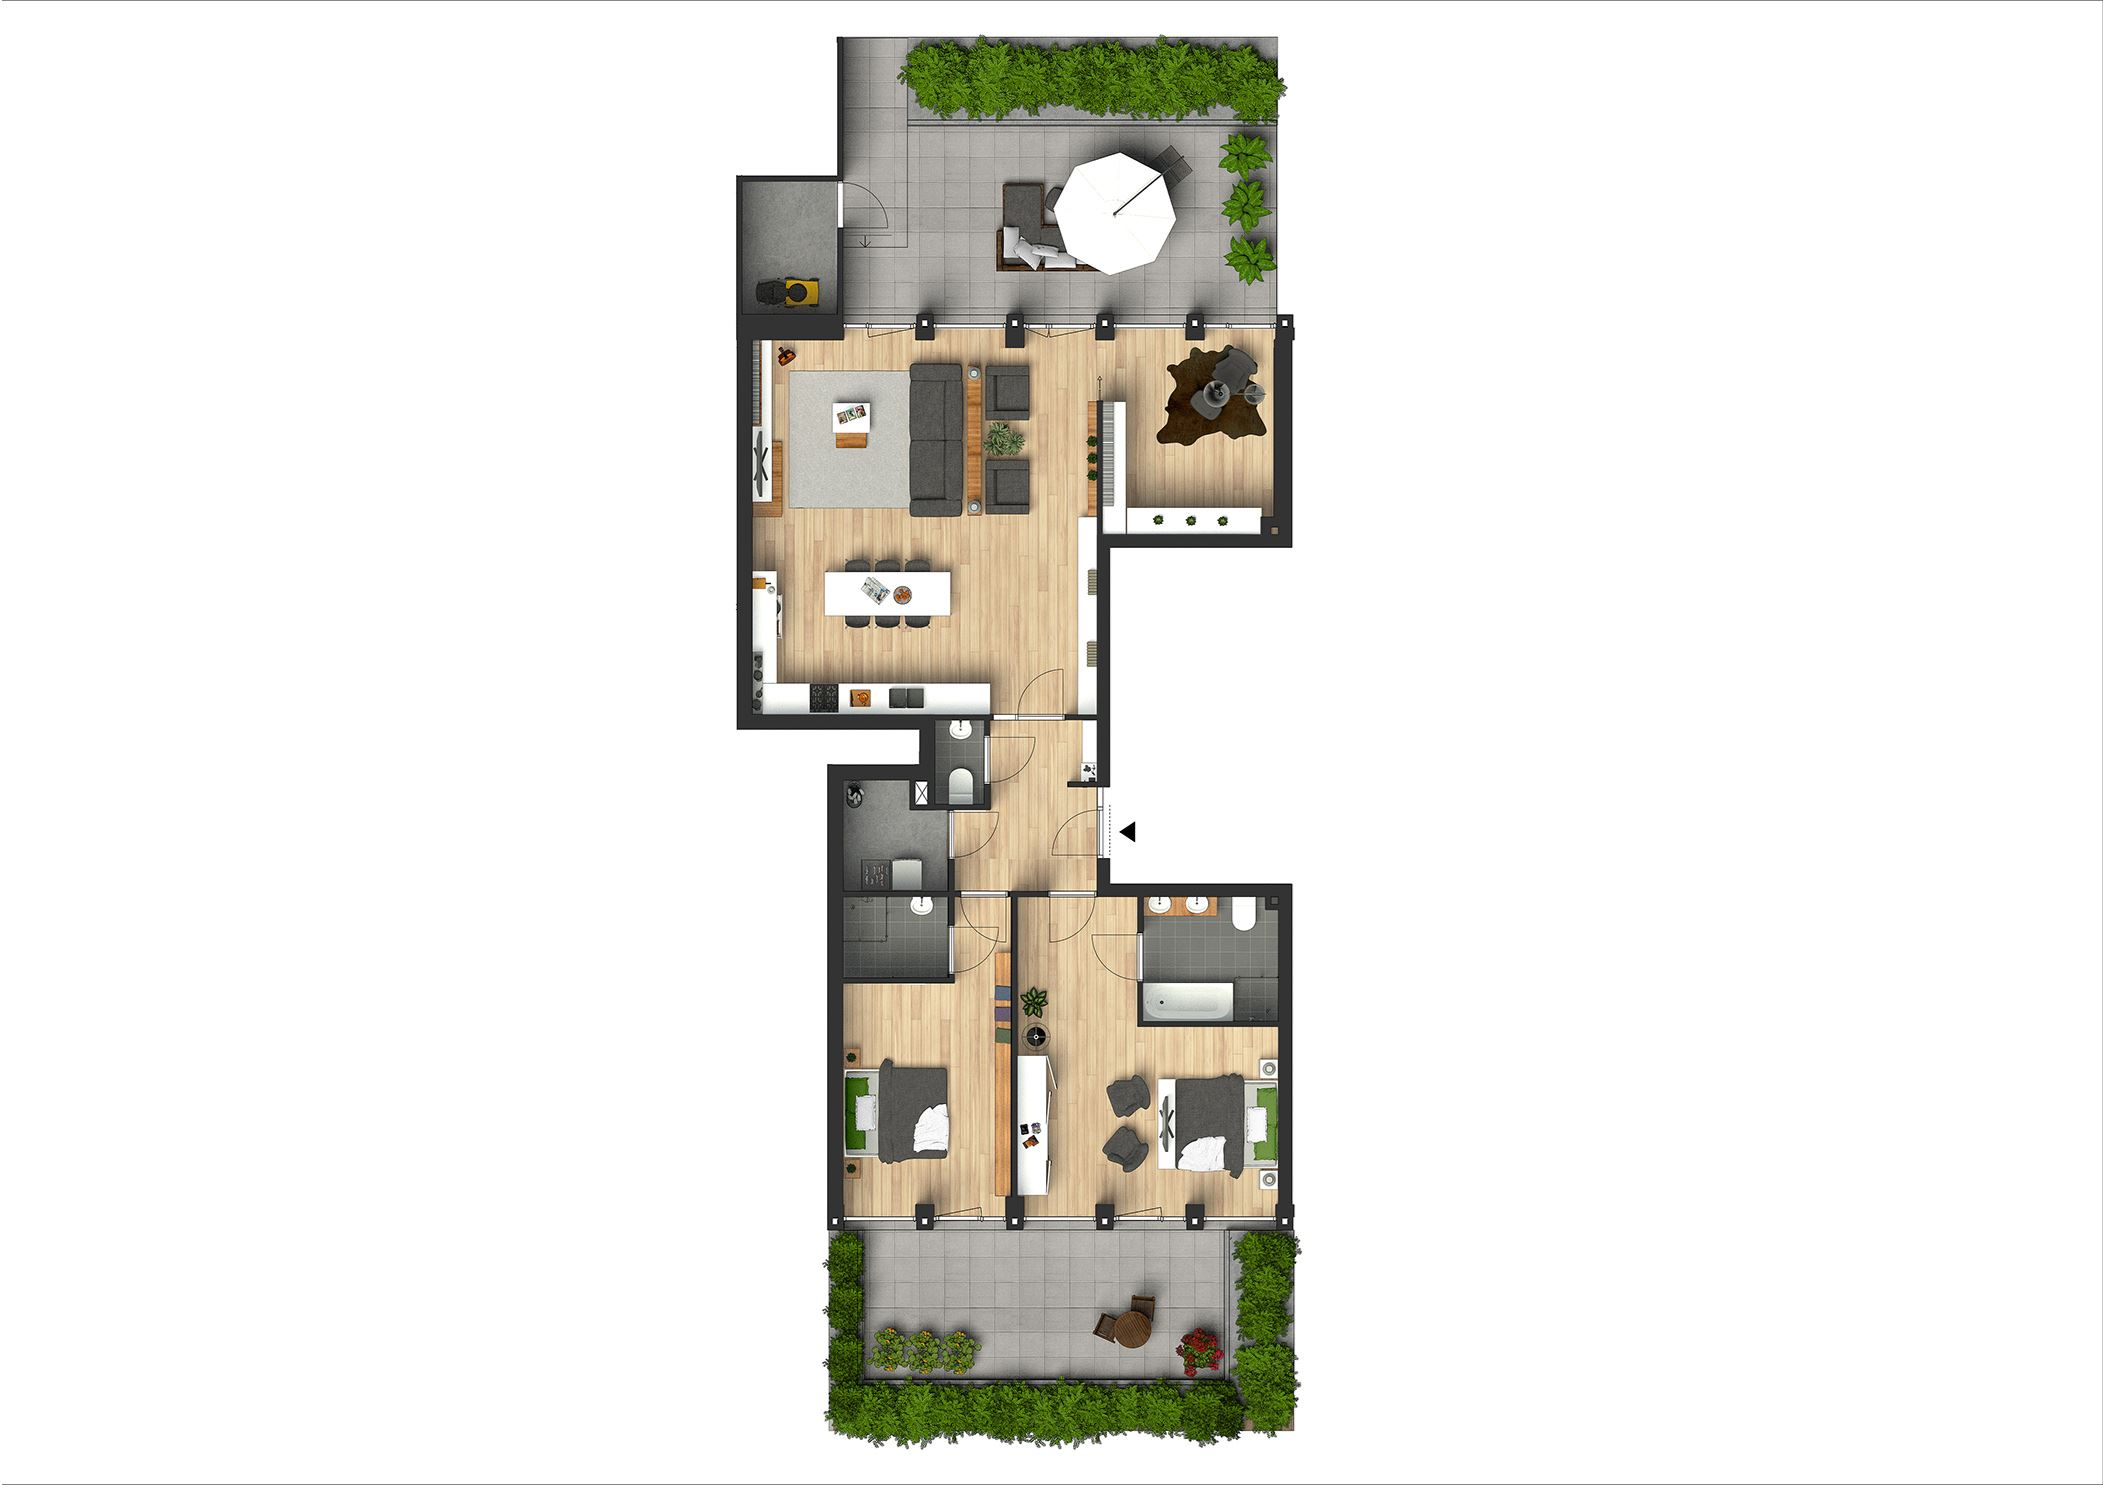 Verkocht stadhoudersplantsoen 4 kamer appartement bouwnr 23 2517 jl den haag funda - Ondergrondse kamer ...